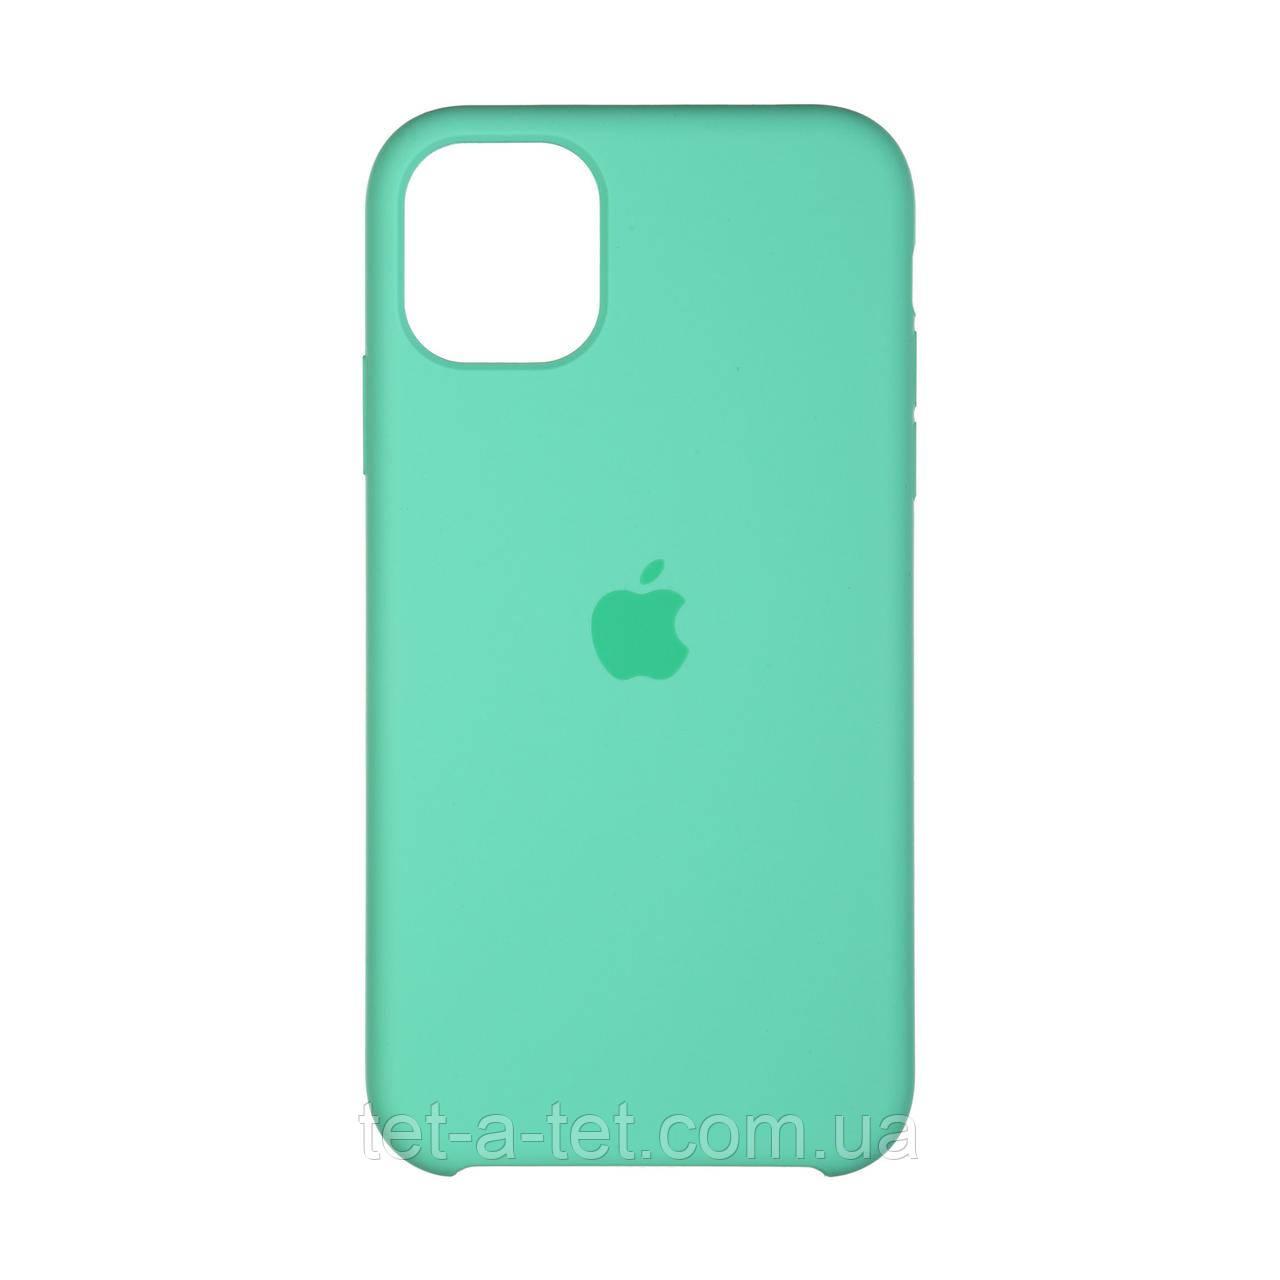 Чохол силіконовий для Apple iPhone 11 Silicone Case (High Copy) - Spearmint (Світла М'ята)